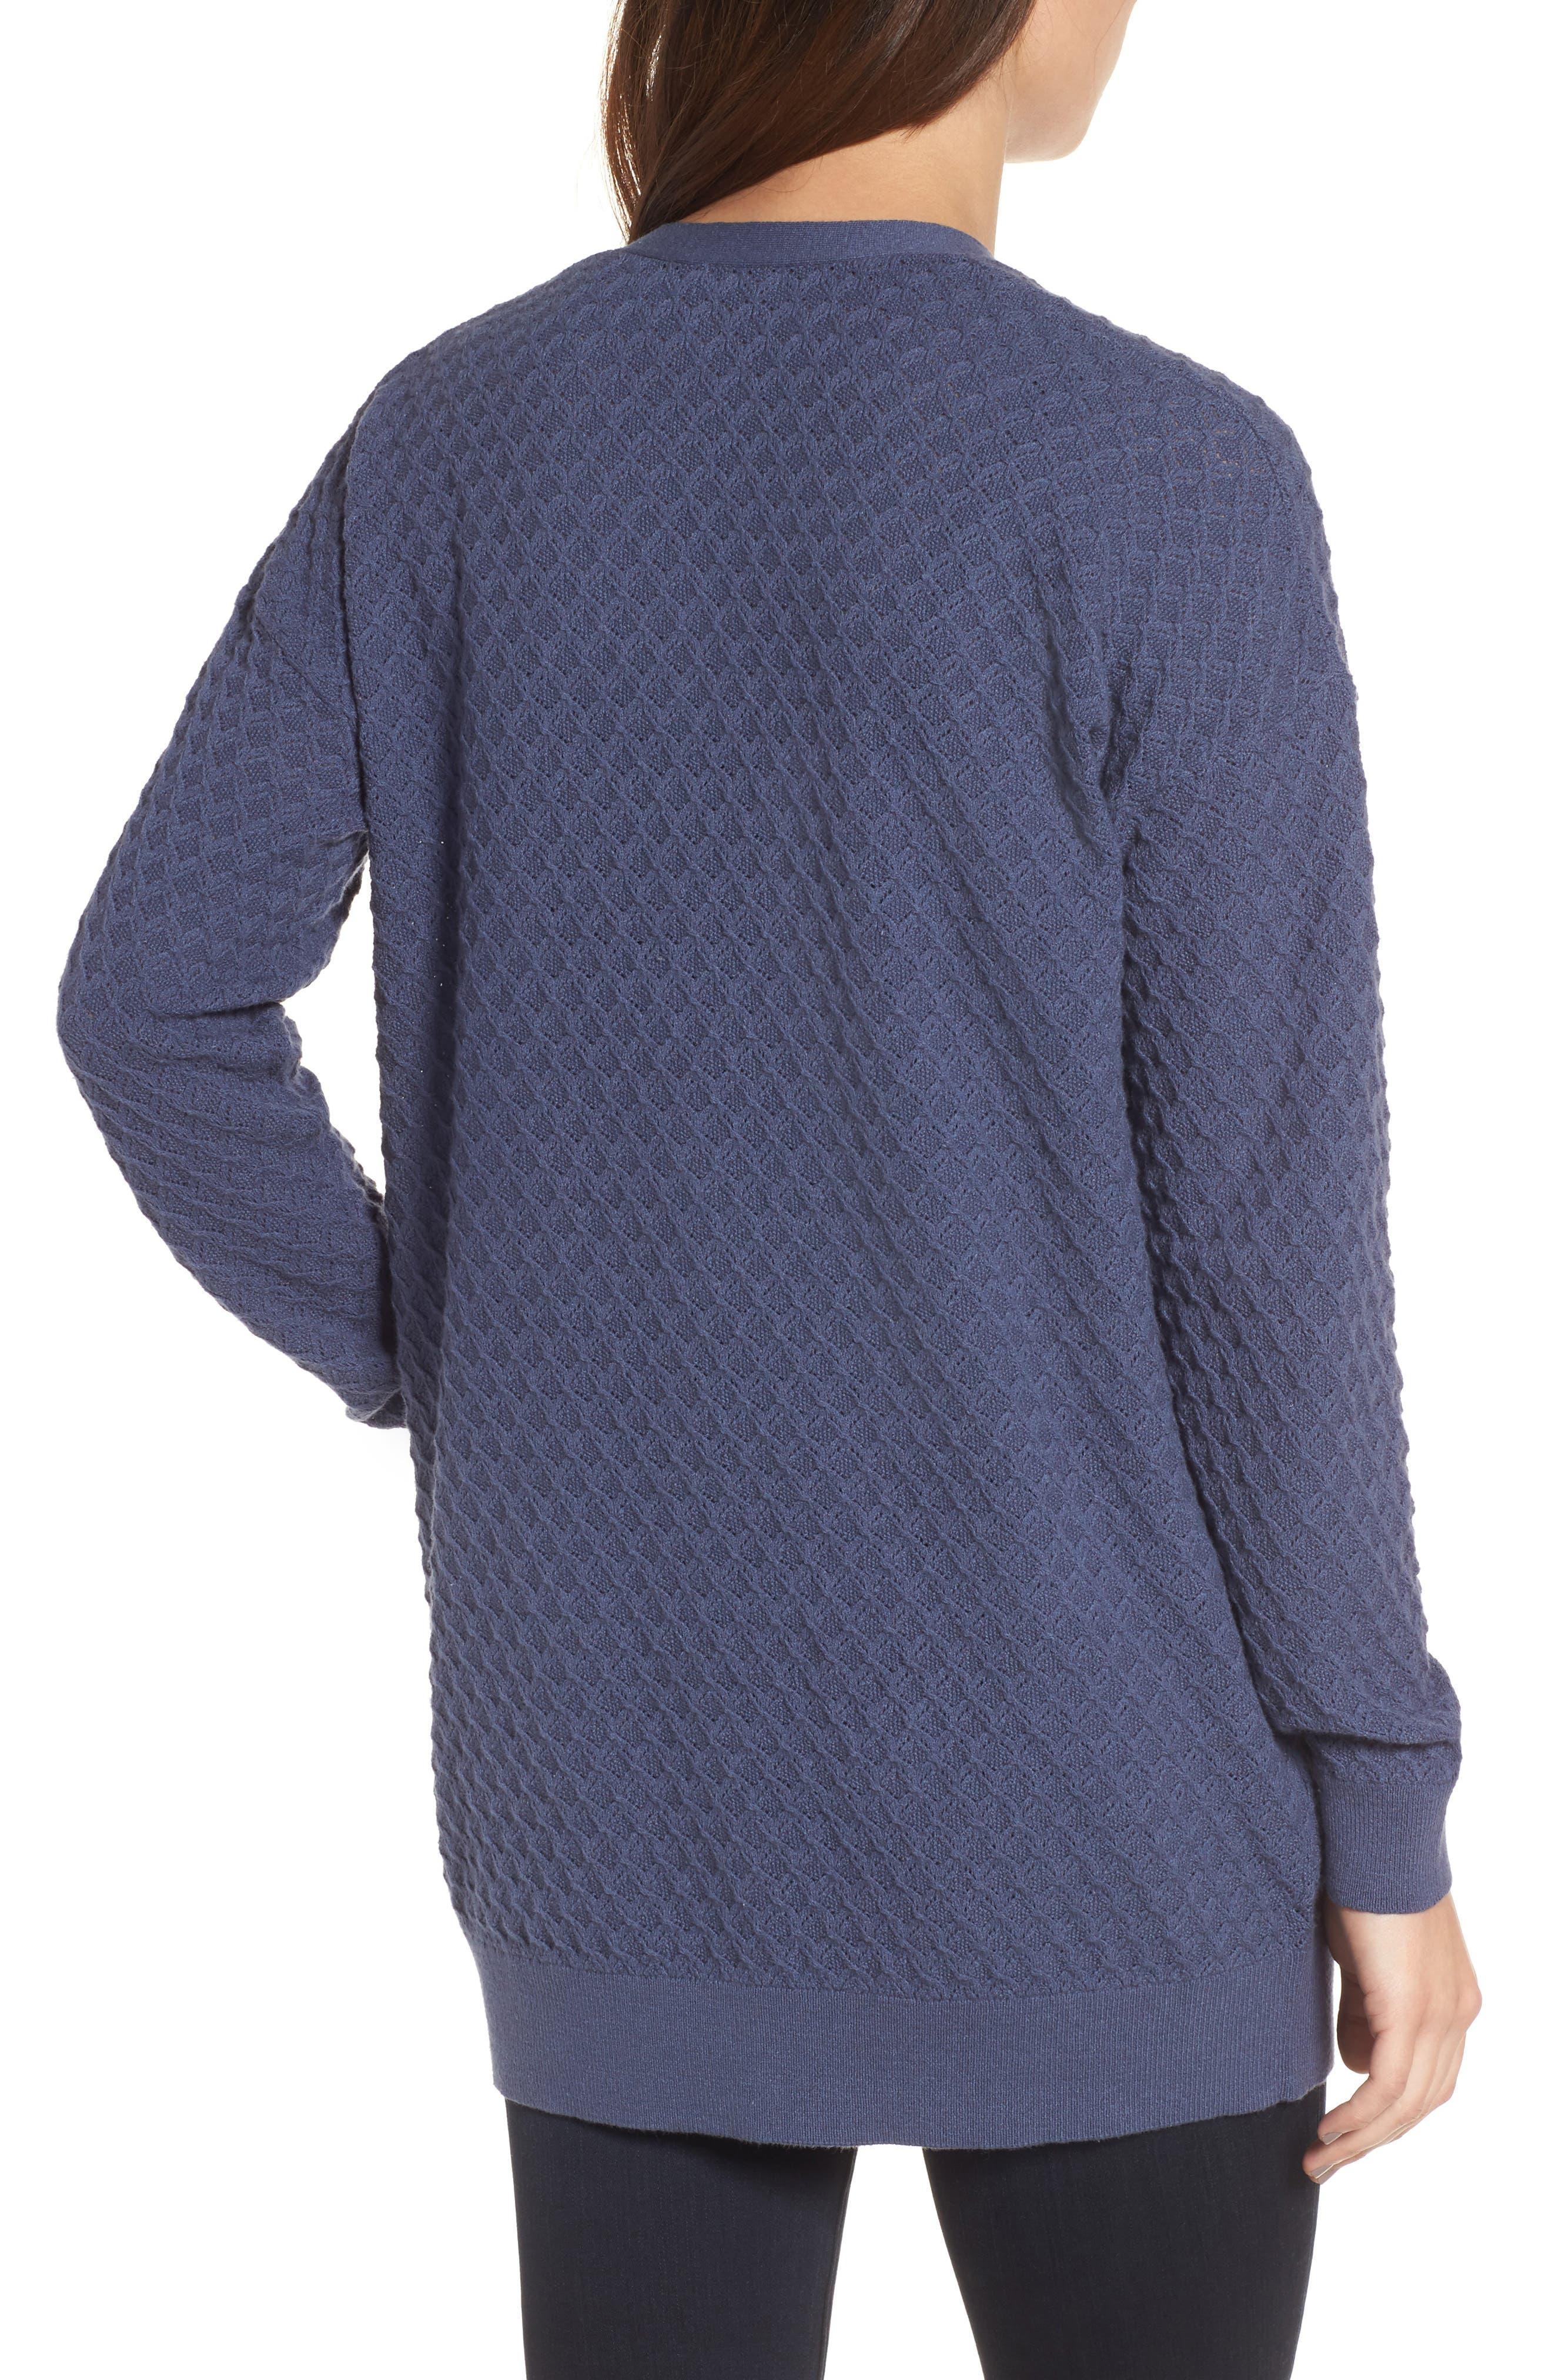 Pointelle Cardigan Sweater,                             Alternate thumbnail 2, color,                             Blue Vintage